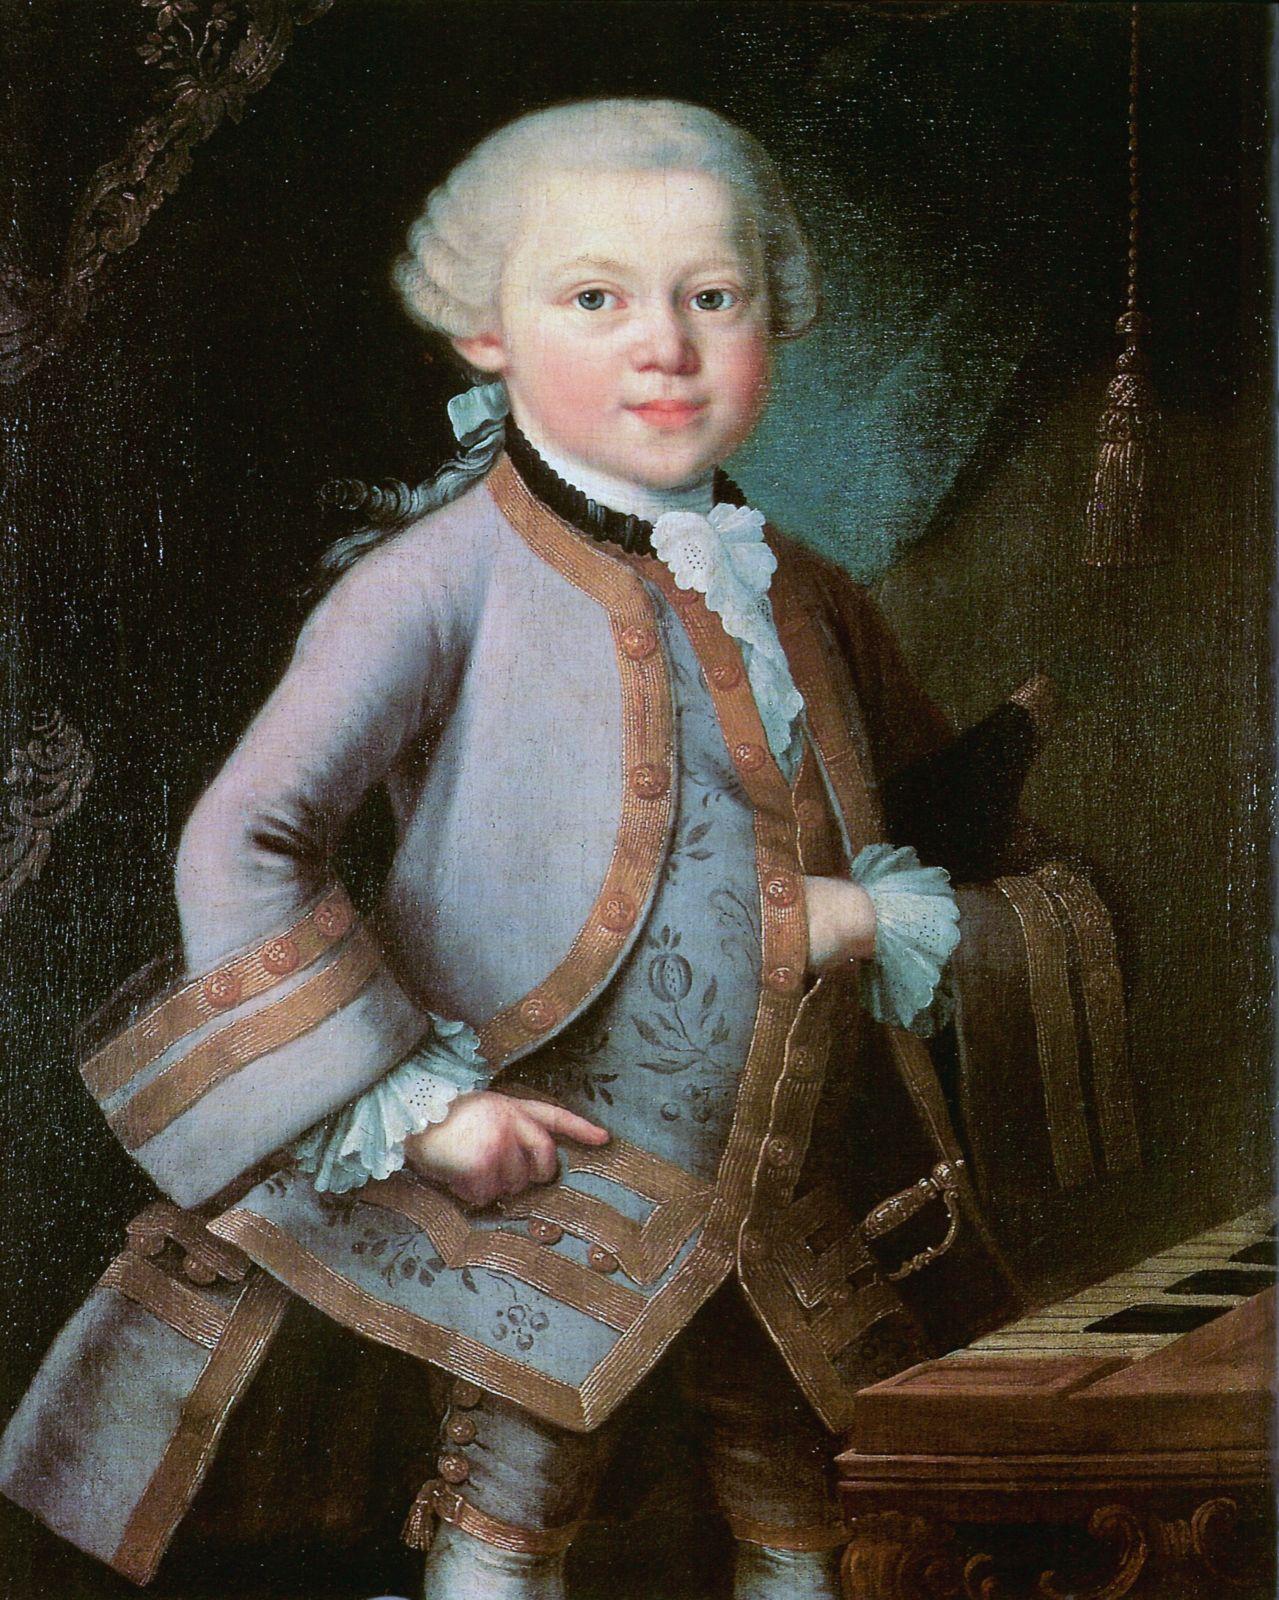 Wolfgang-amadeus-mozart_2 jeugd